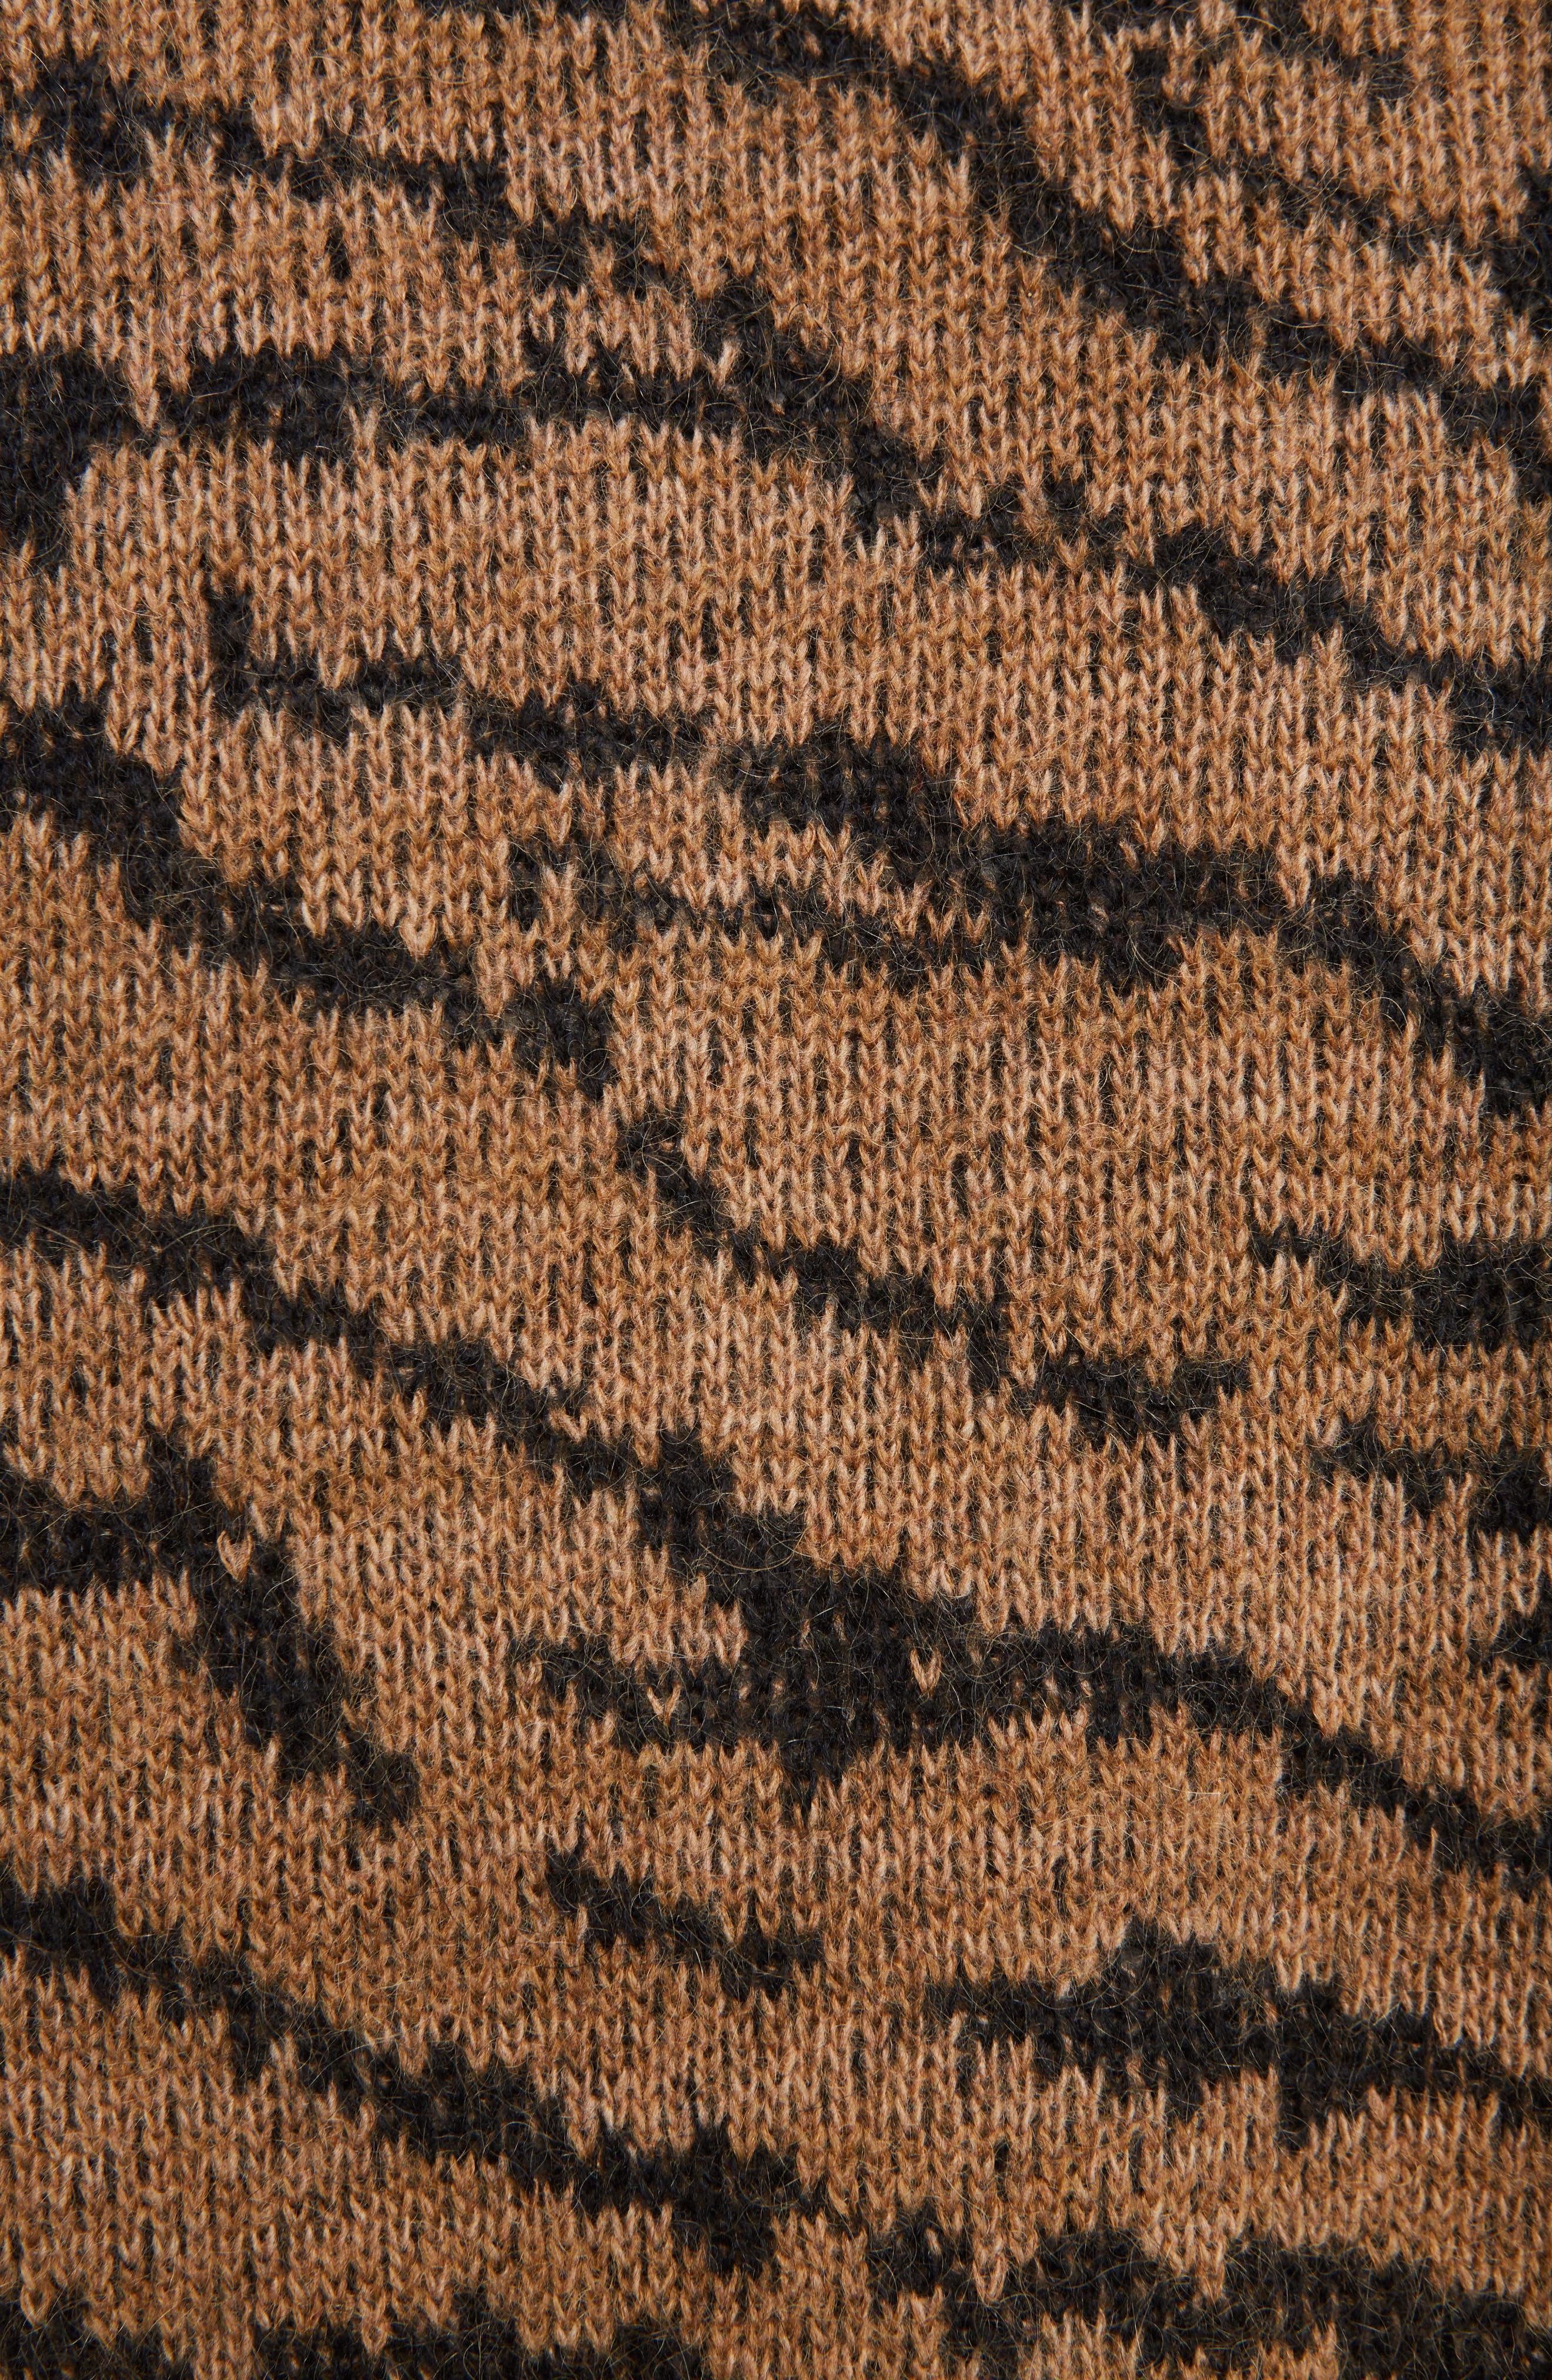 Tiger Jacquard Knit Button Cardigan,                             Alternate thumbnail 3, color,                             Beige